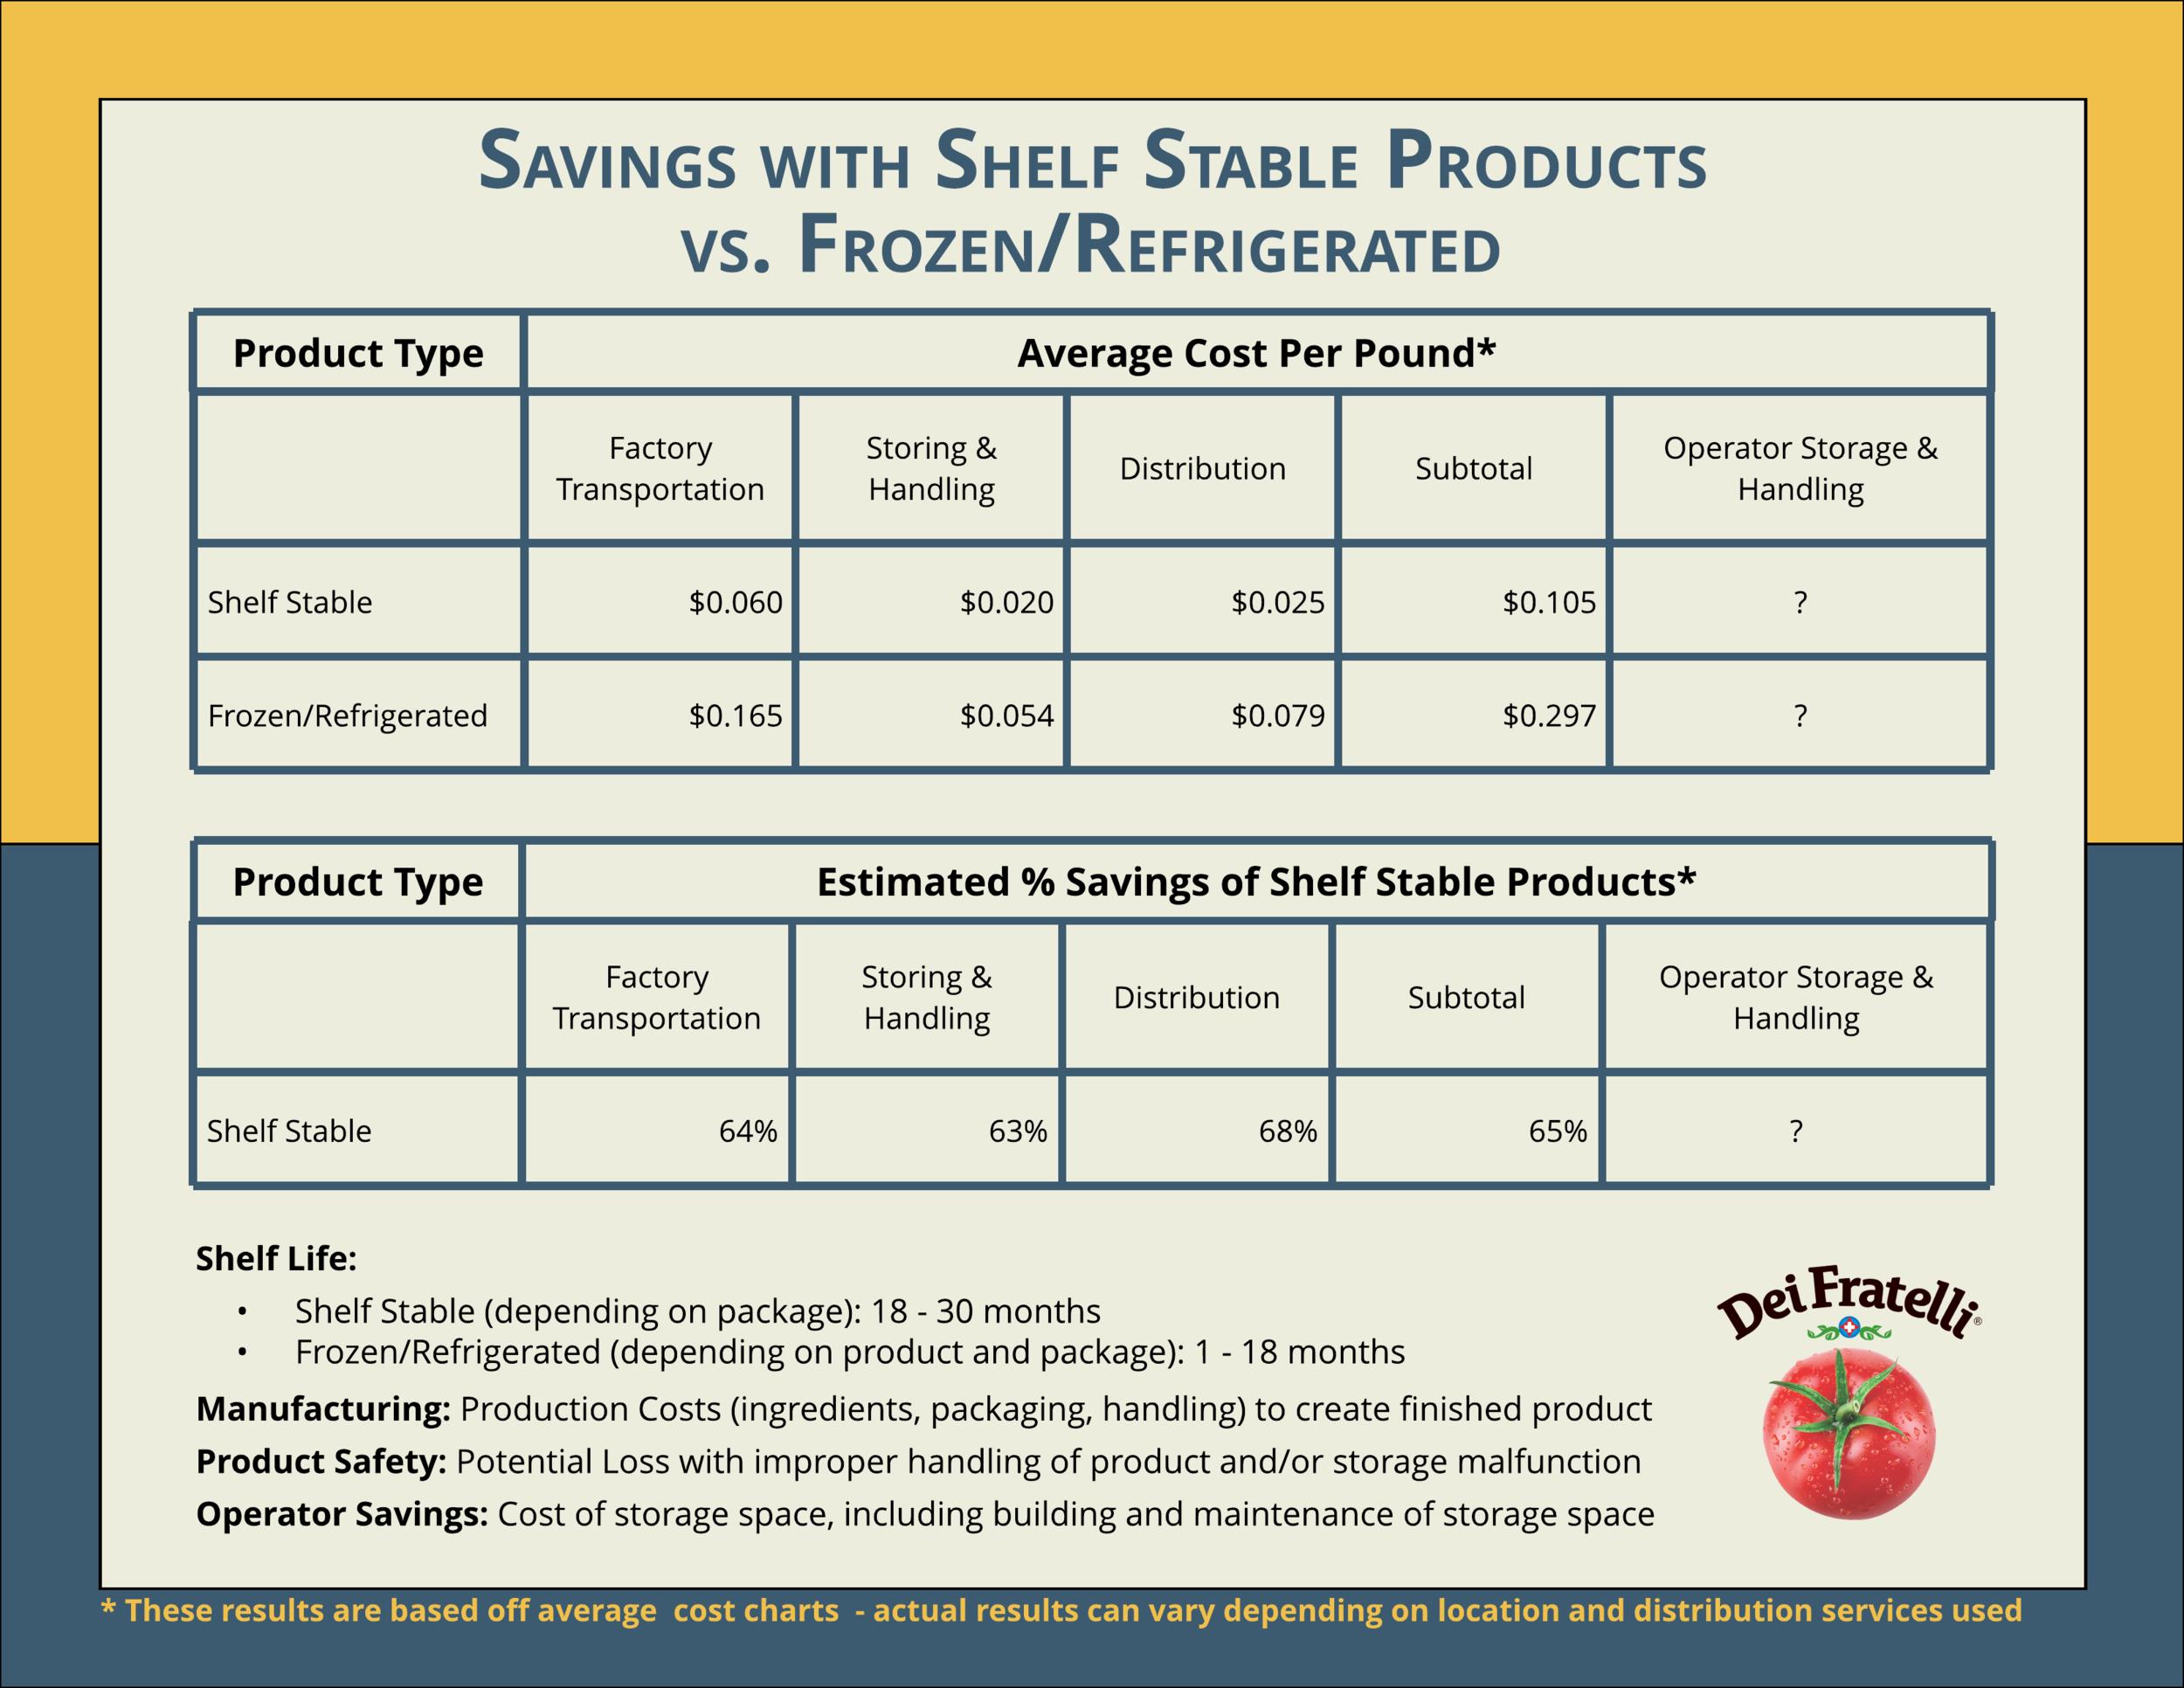 Shelf Stable Savings